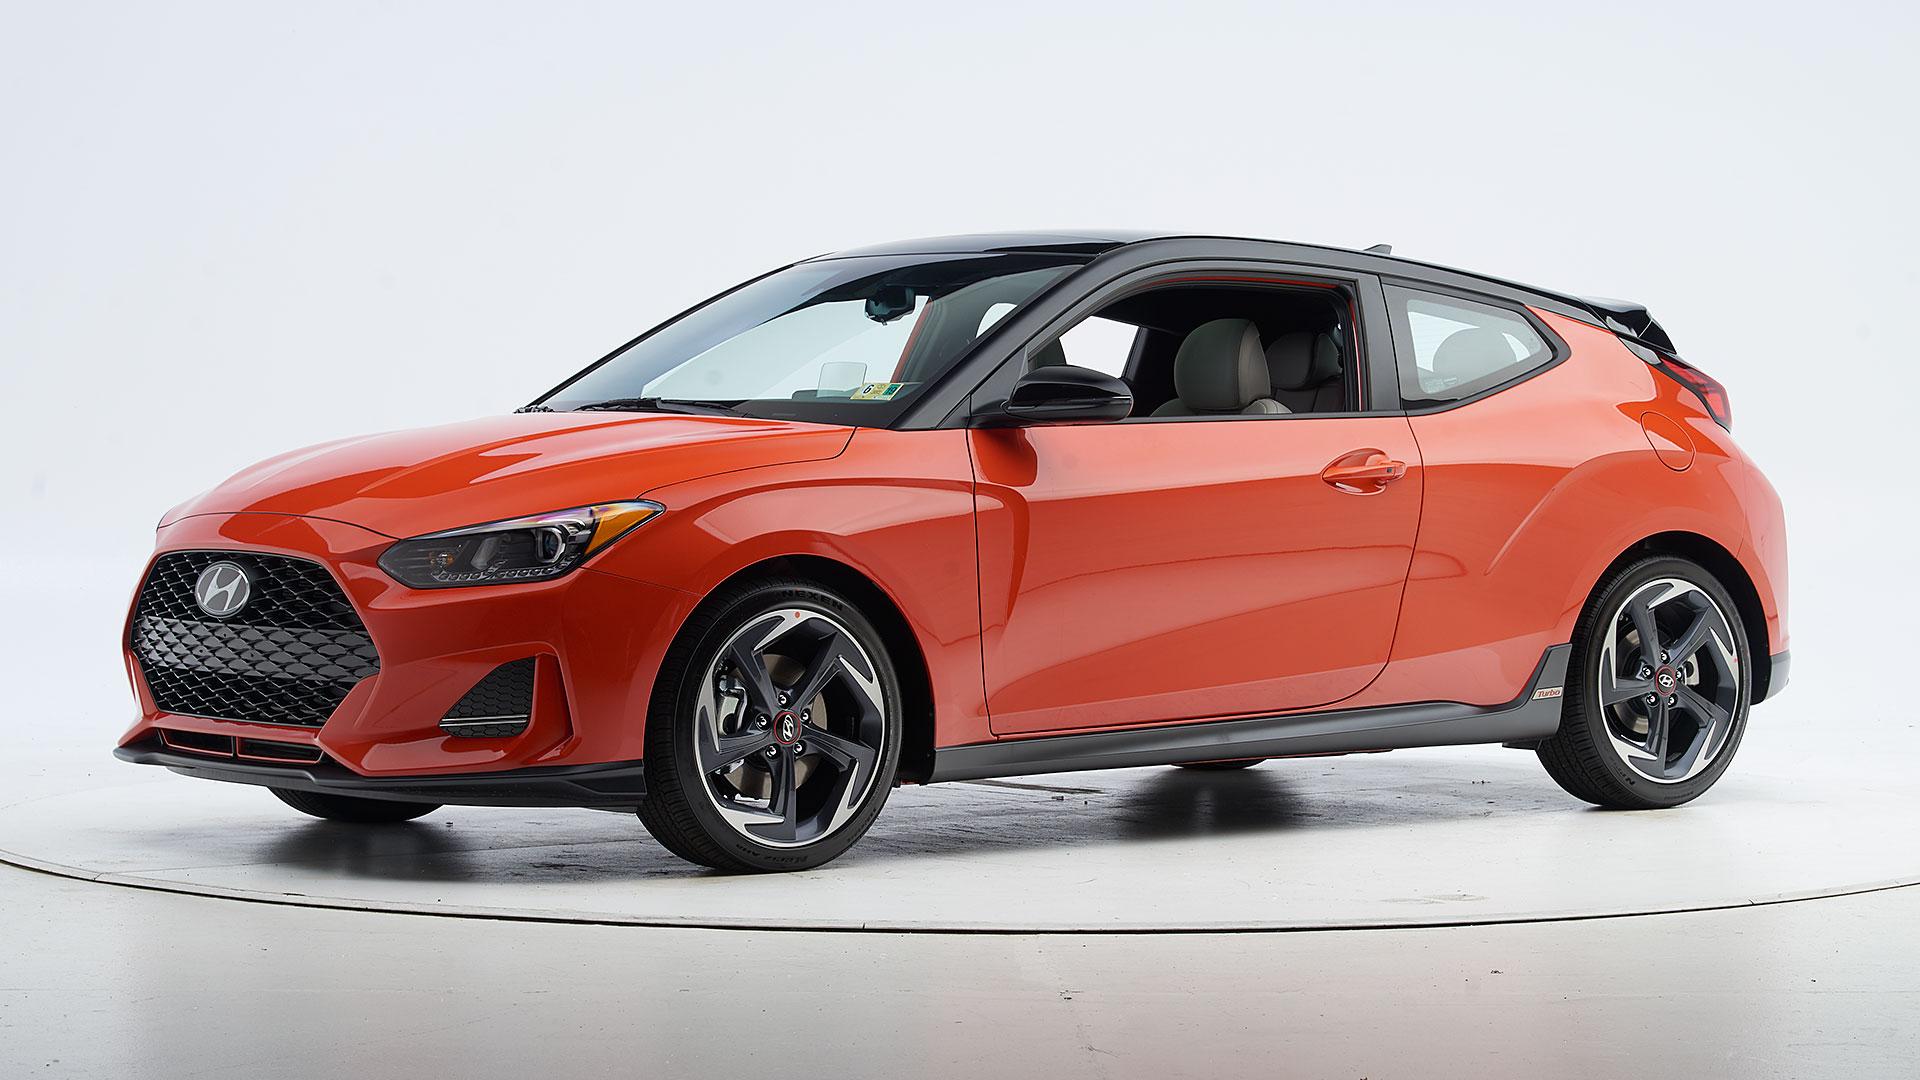 2021 Hyundai Veloster | Hyundai Two Door Car |  | IIHS